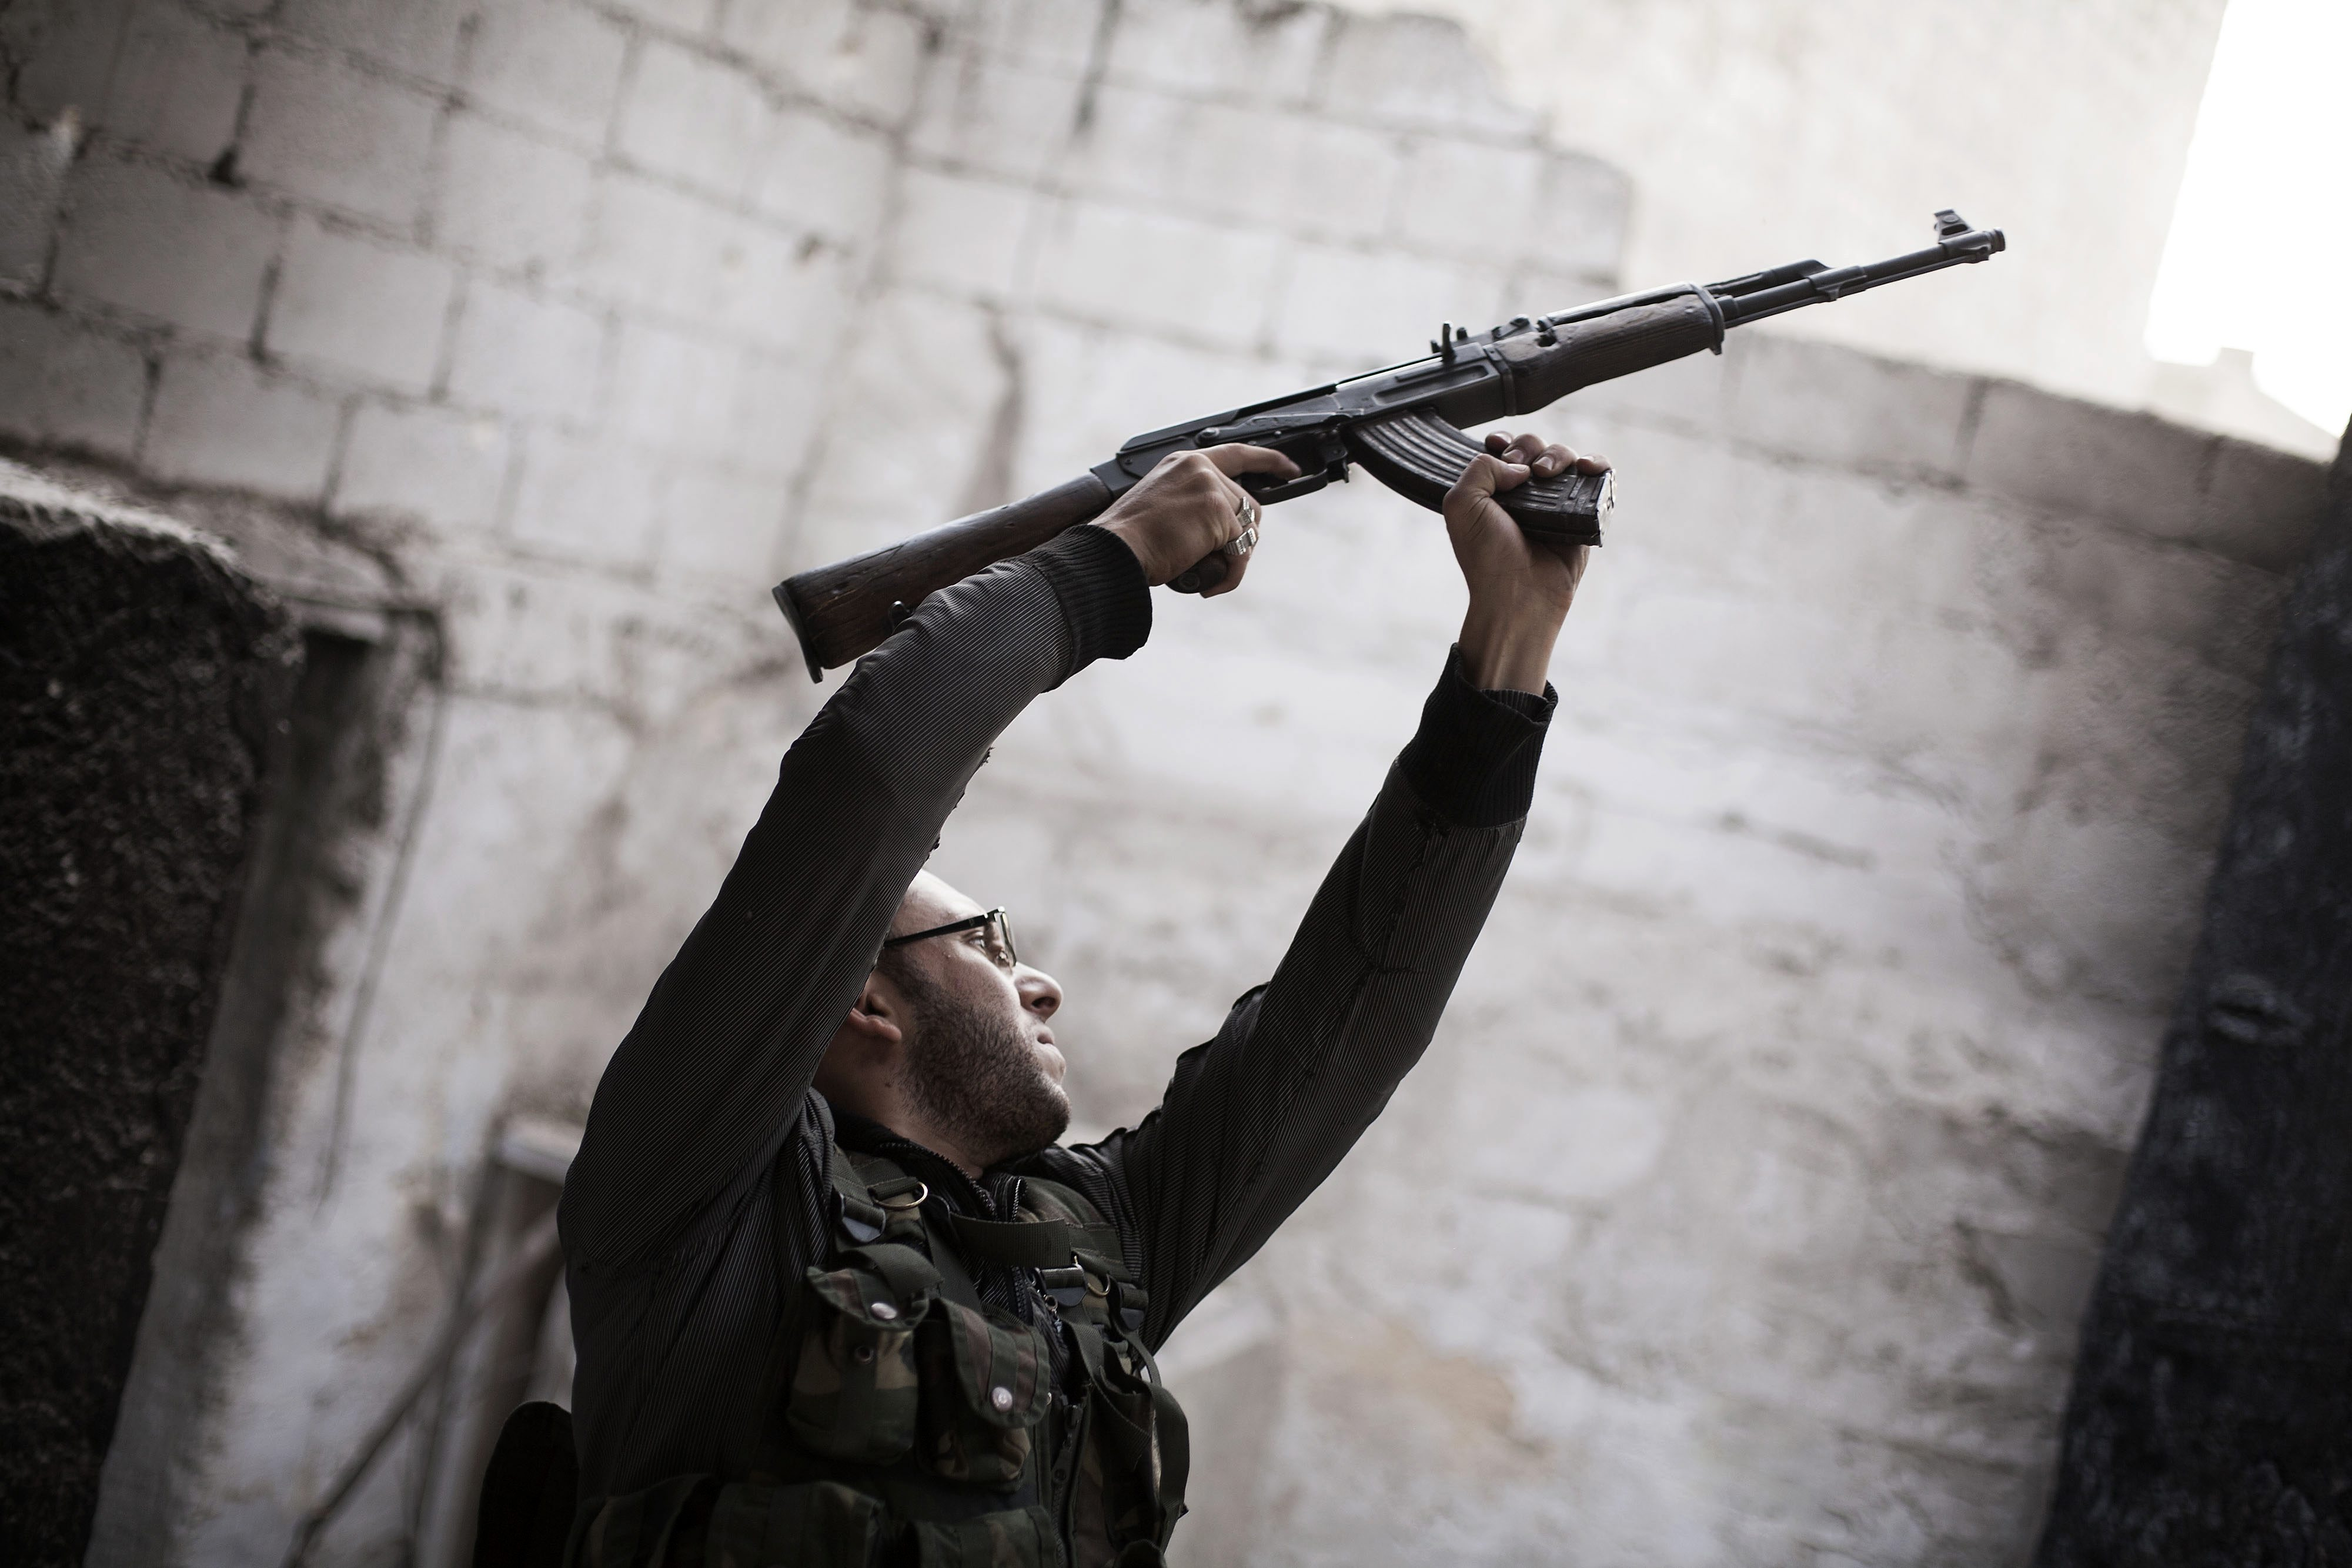 sýrsky konflikt zbrane